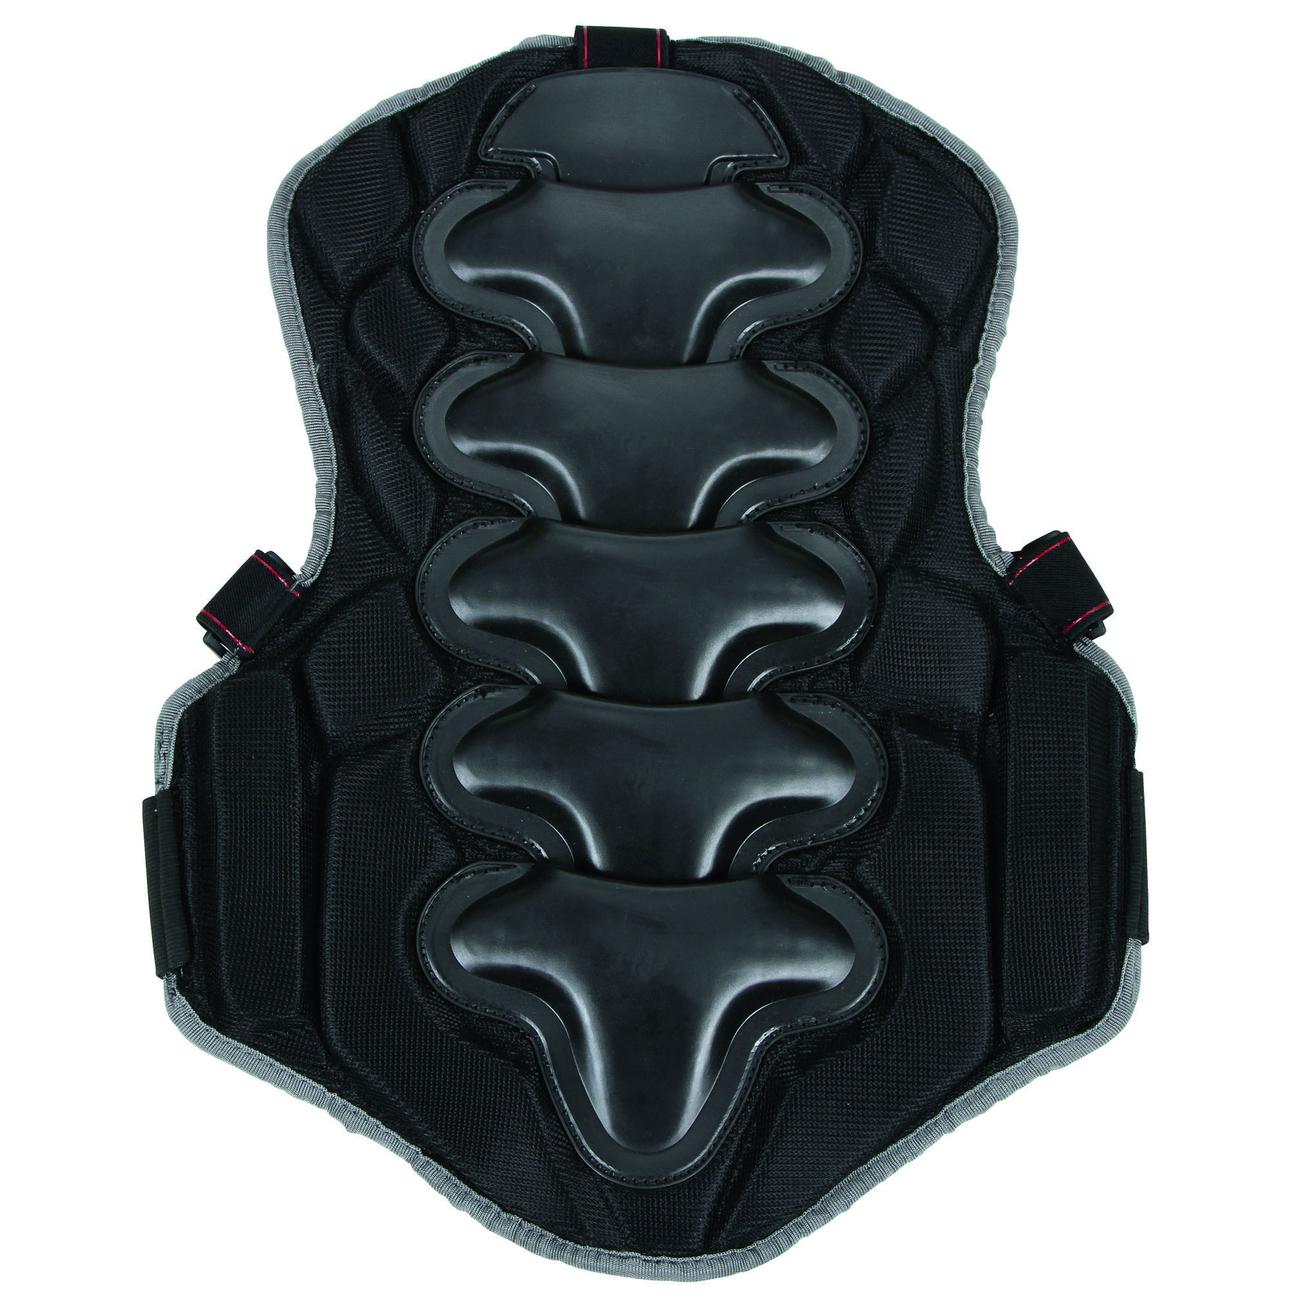 Kerbl Wirbelsäulenschutz Rückenschutz Reiten BackPro